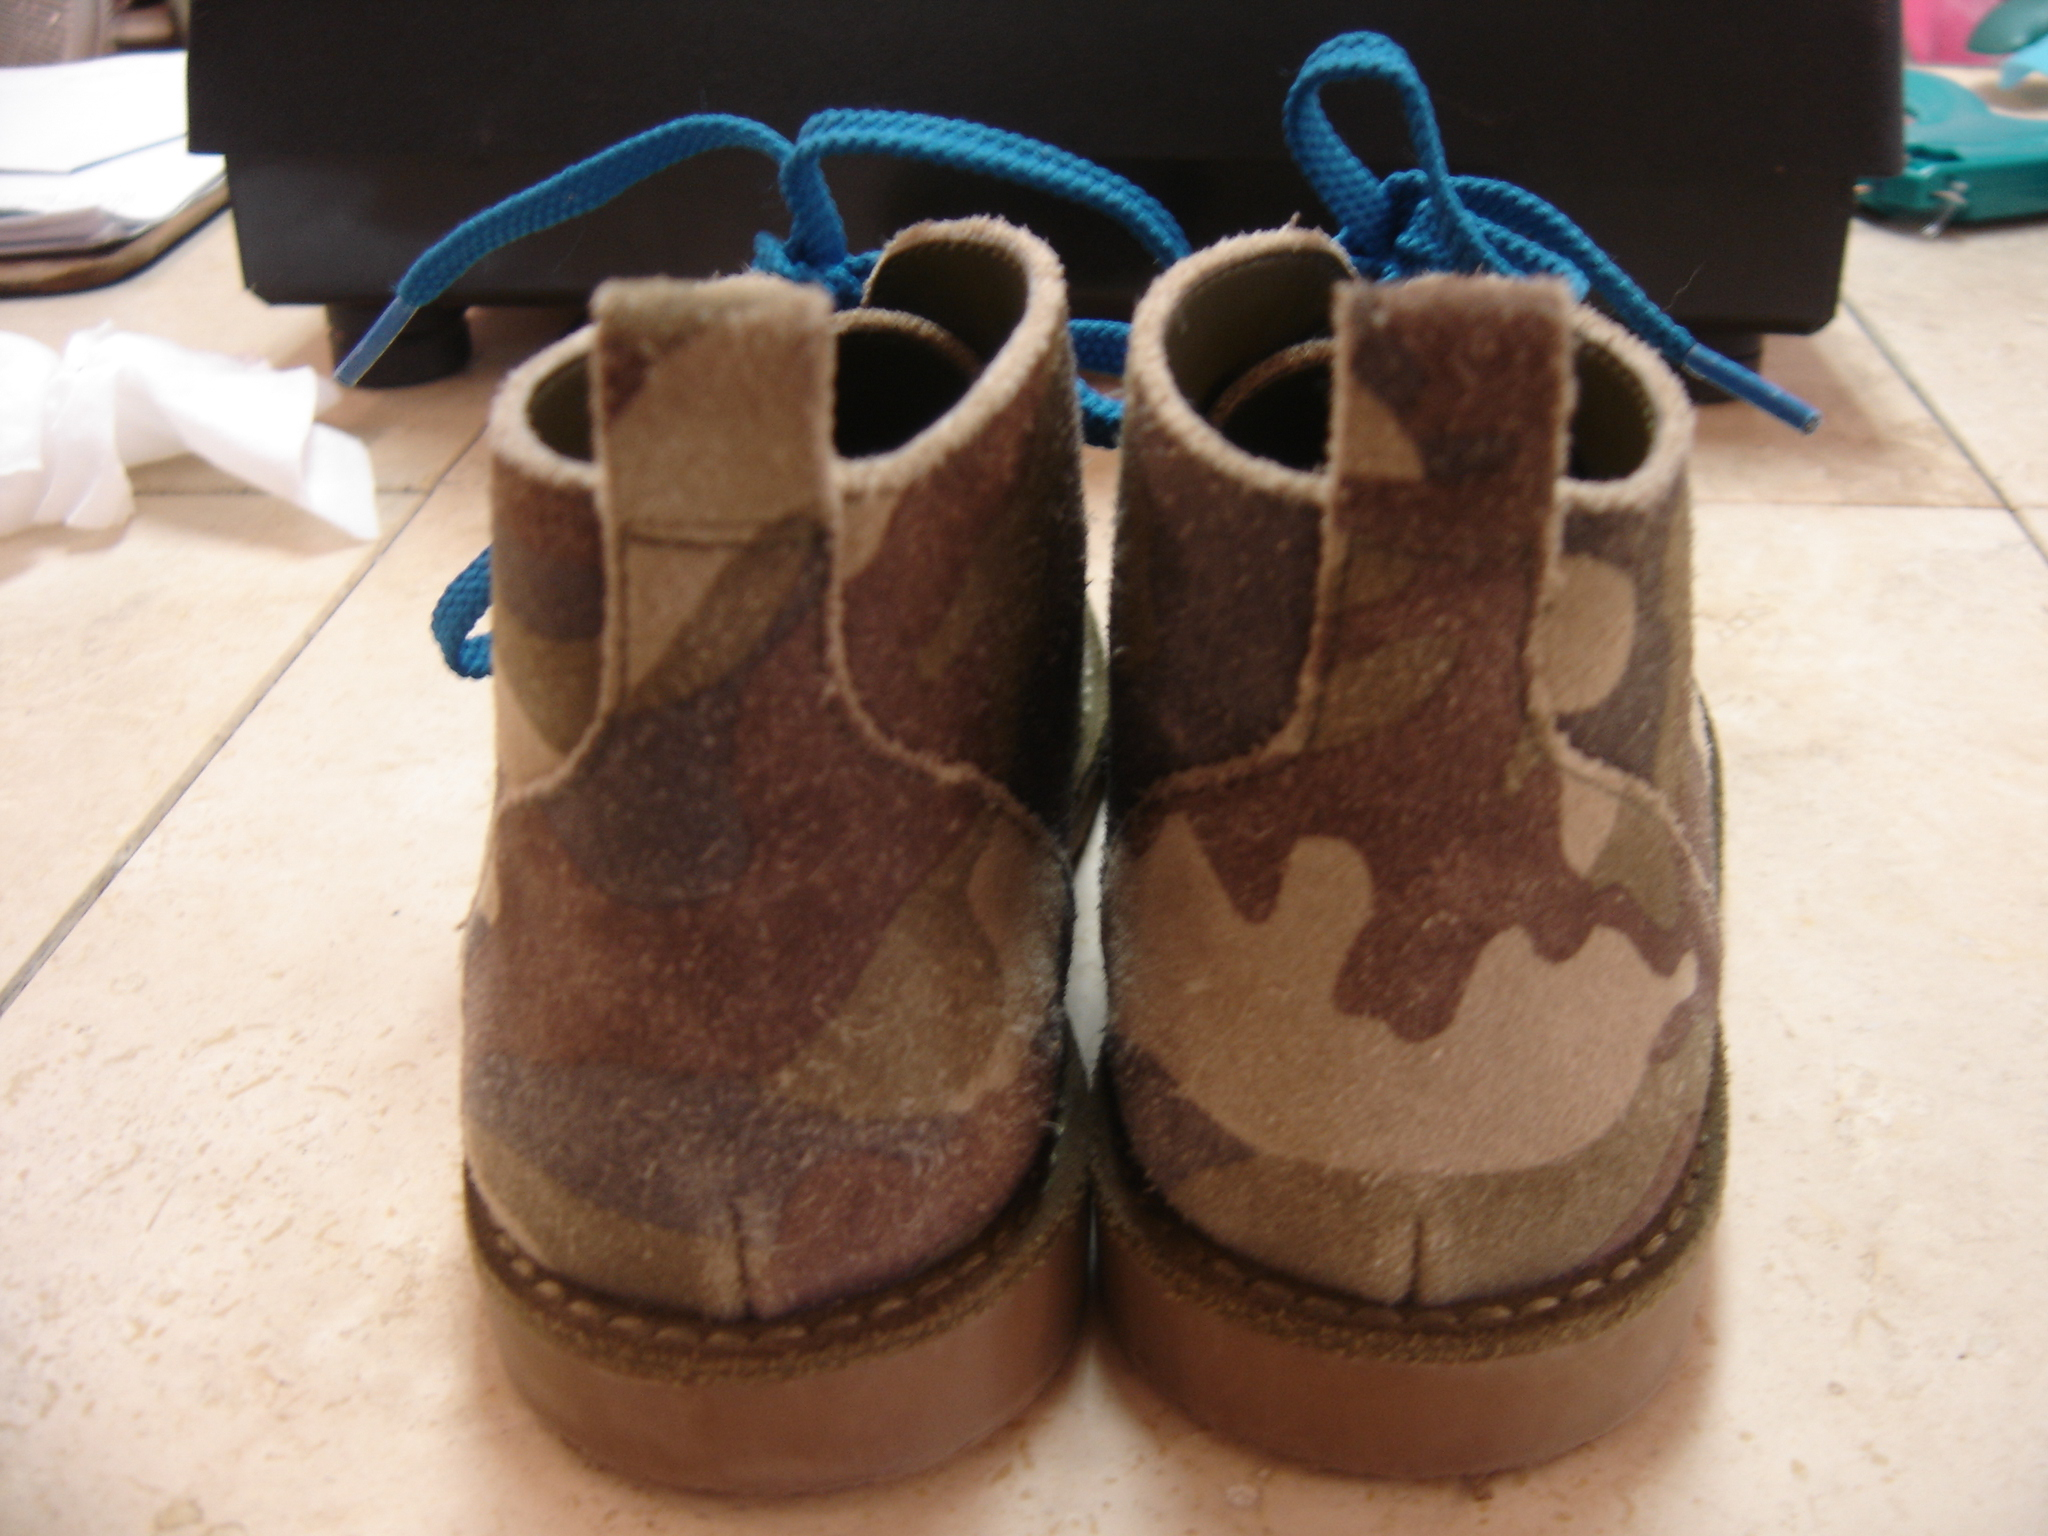 Lands End Toddler Shoes Print Discount